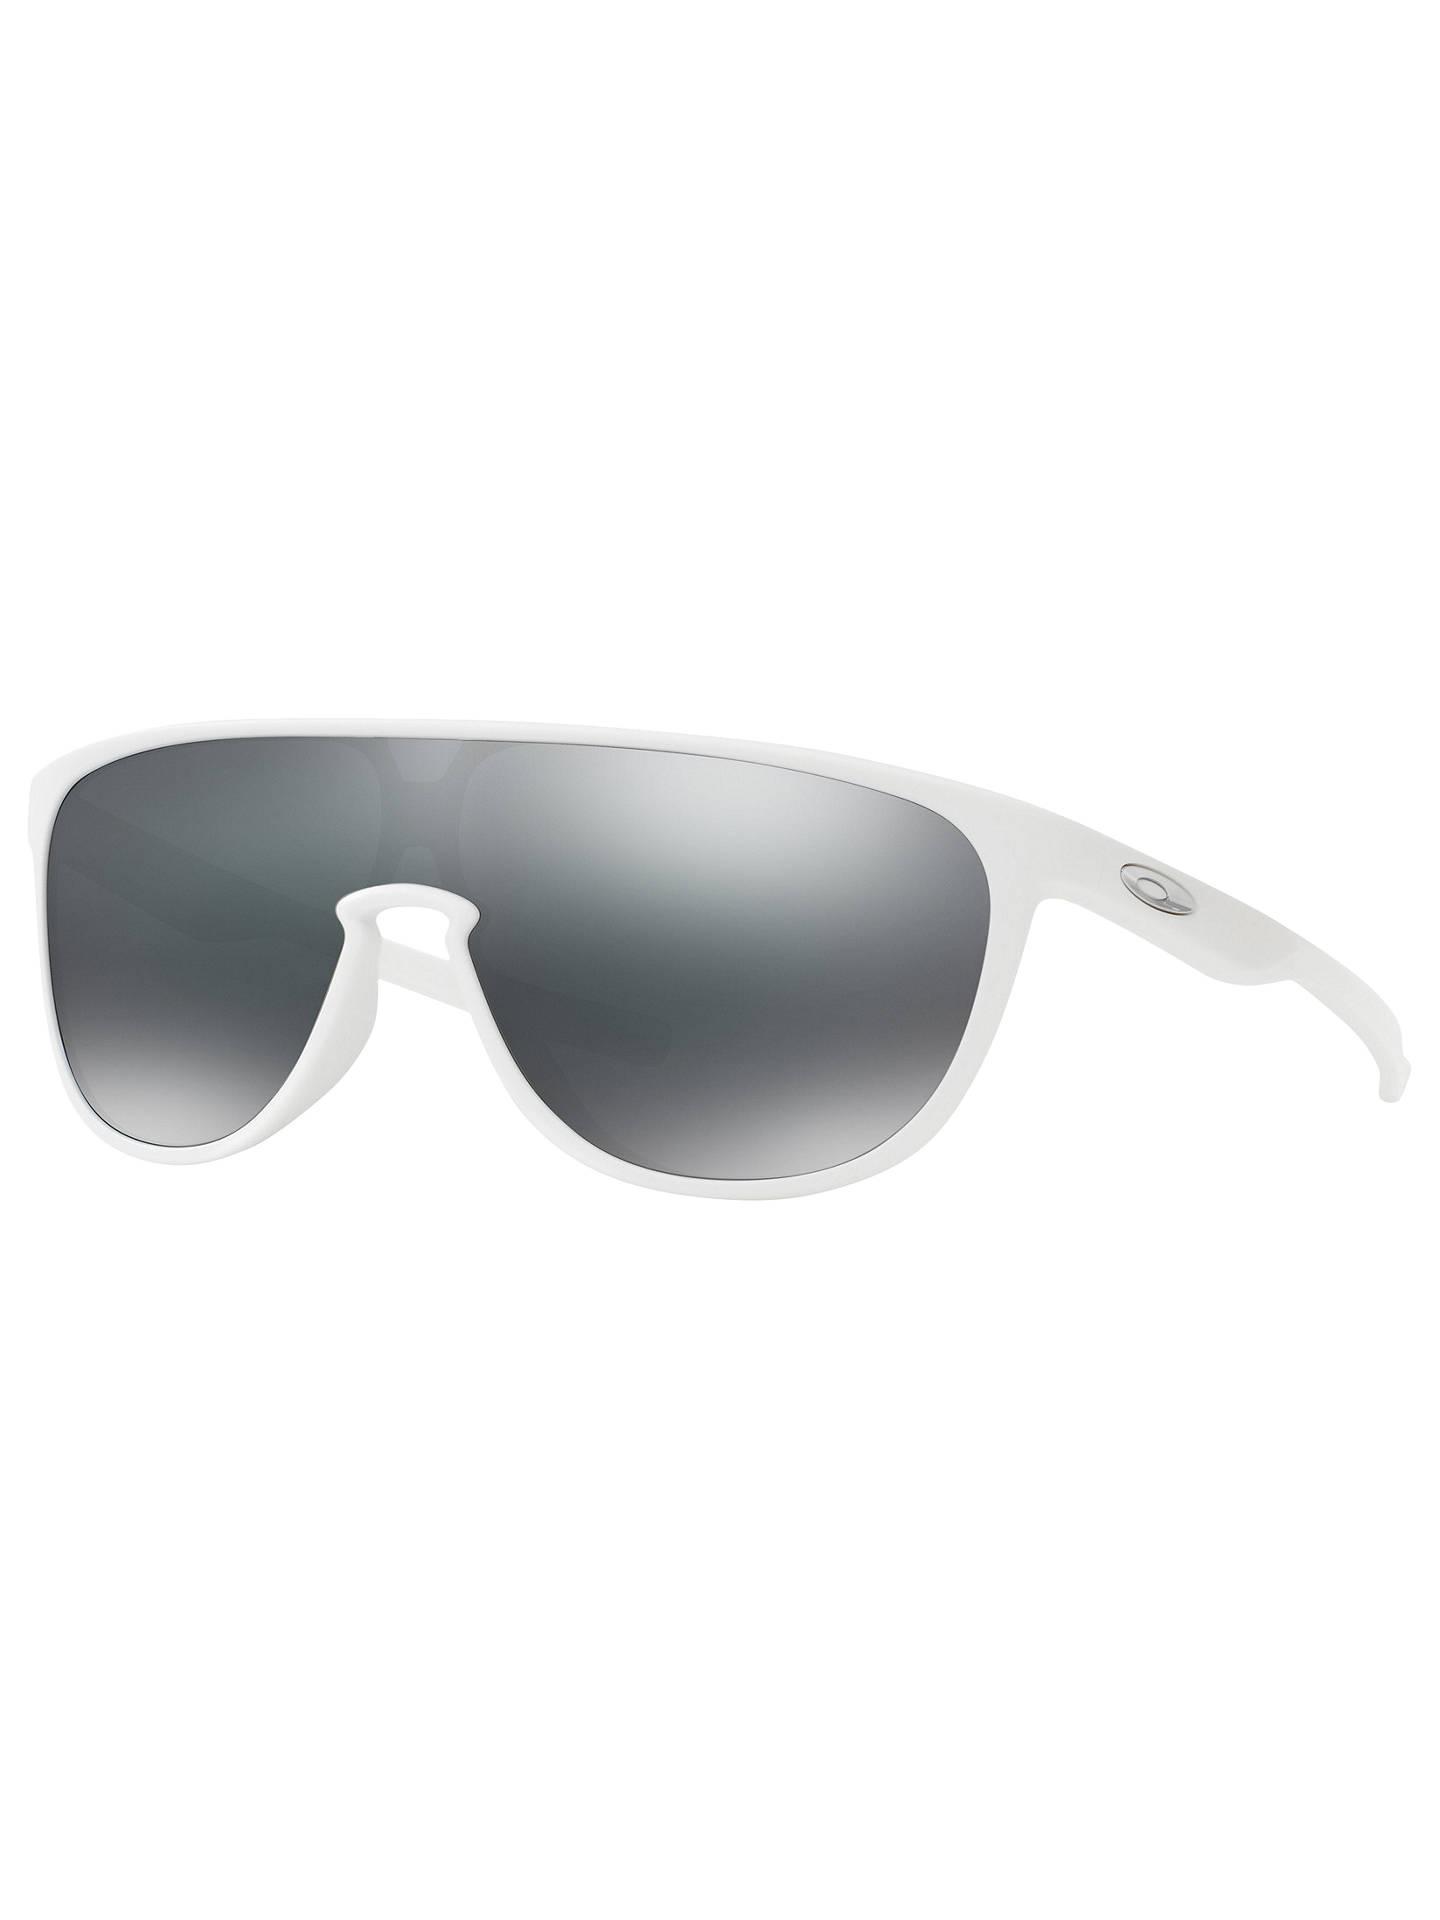 5099dc03b7e Oakley OO9318 Trillbe Rectangular Sunglasses at John Lewis   Partners